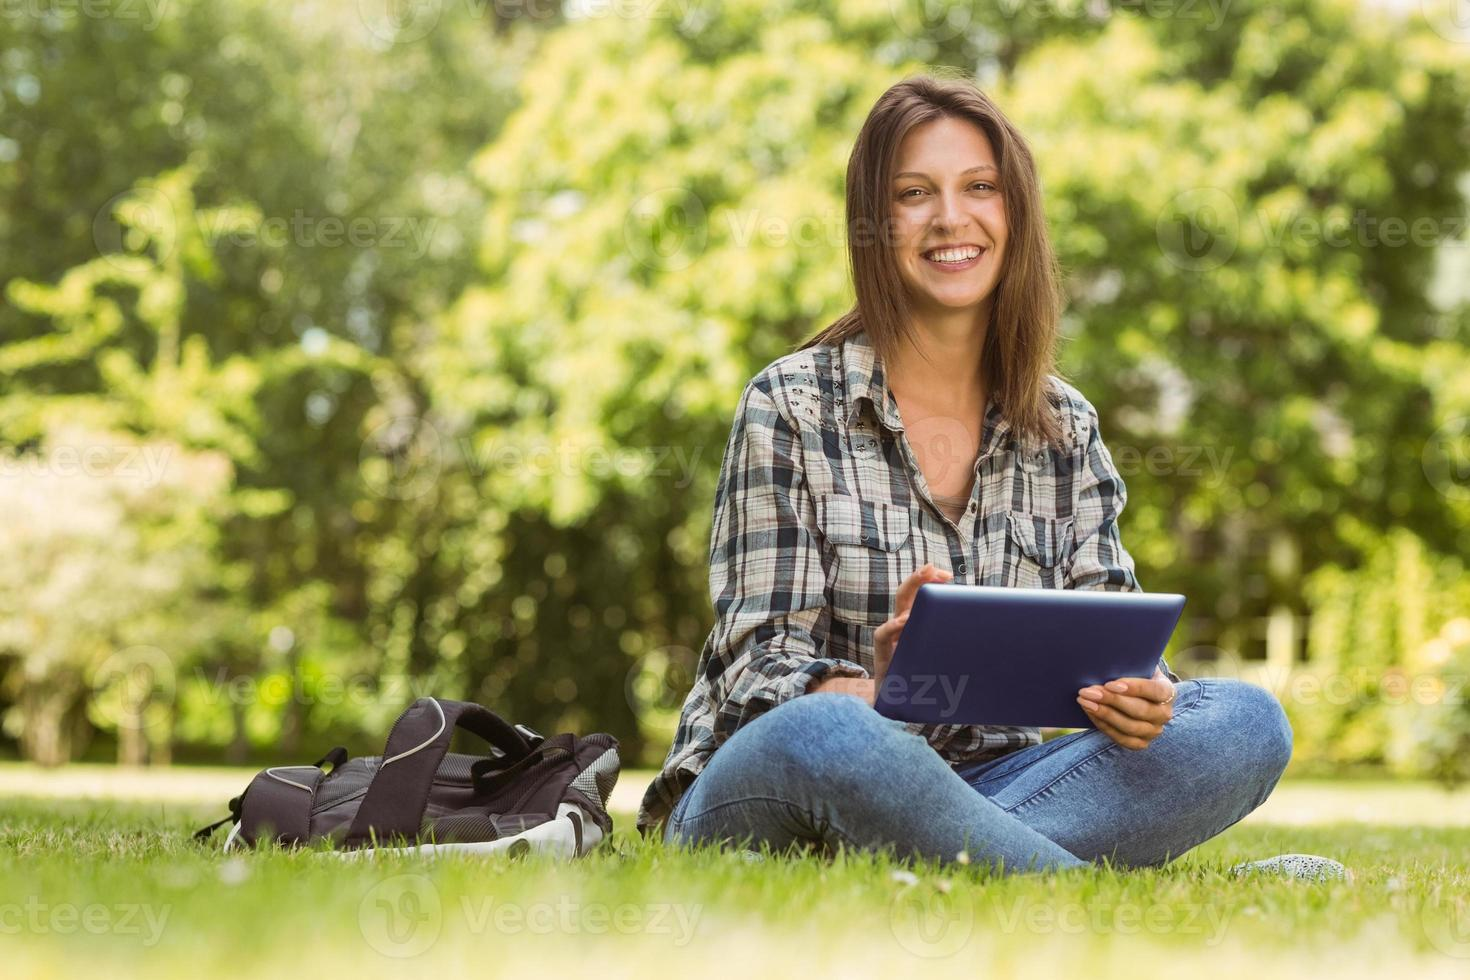 studente sorridente seduto e utilizzando tablet pc foto